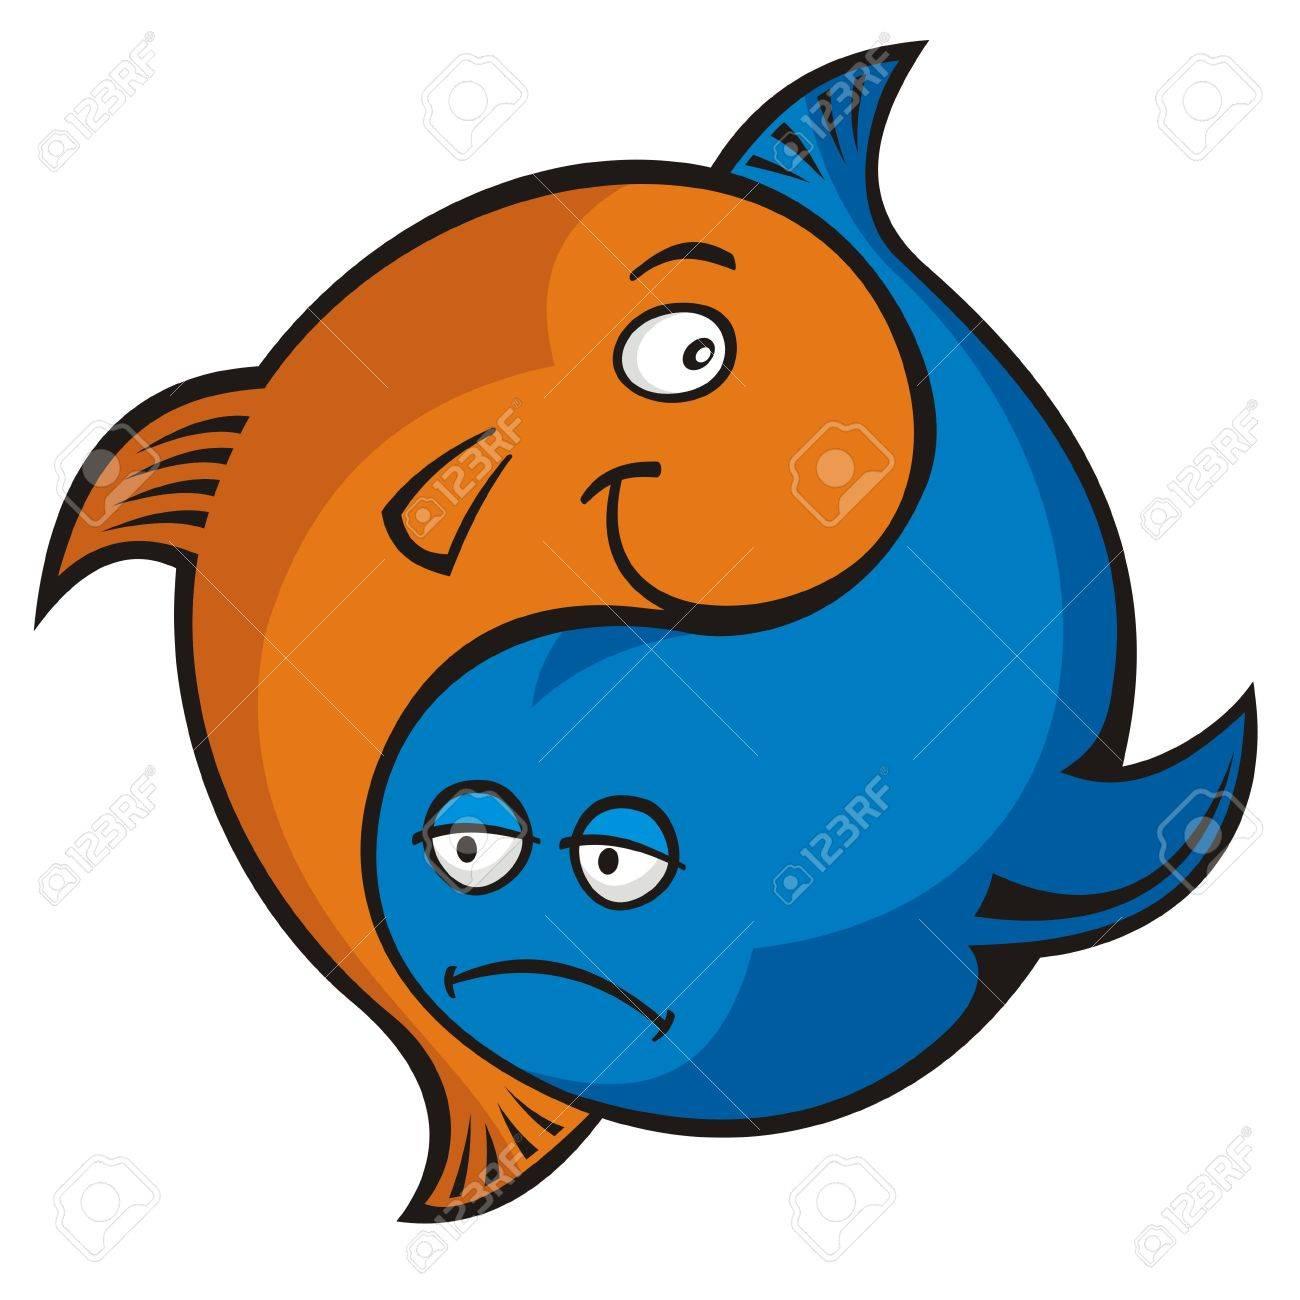 Blue and orange cartoon fish yin yang or pisces symbol - 5871212